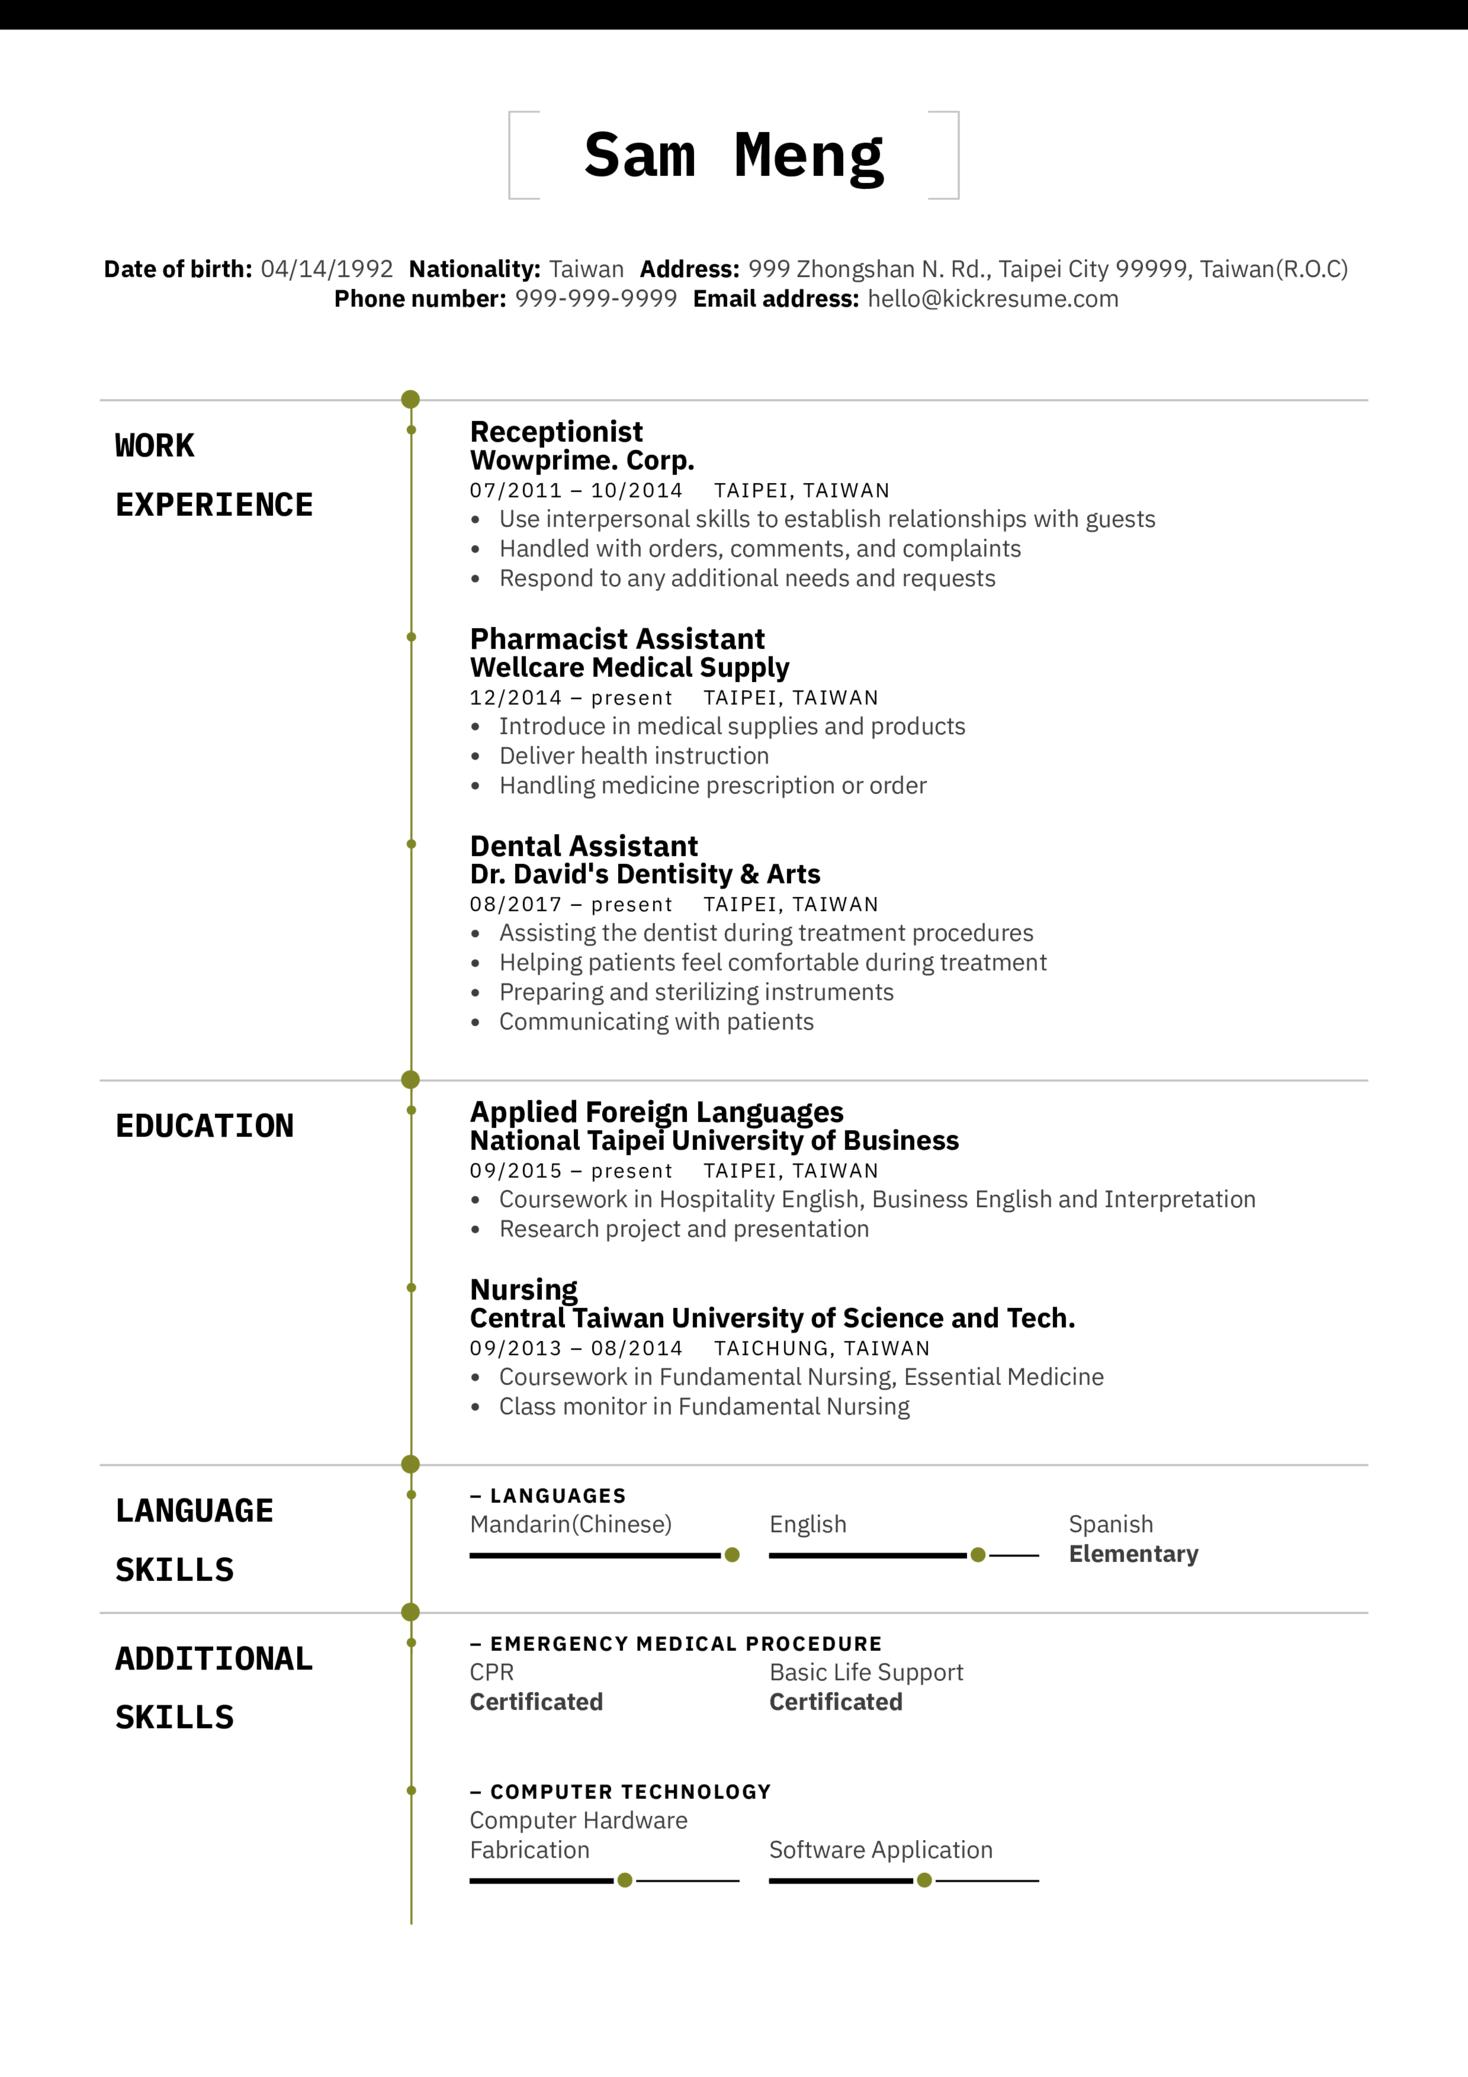 Dentist Assistant Resume Sample (Parte 1)